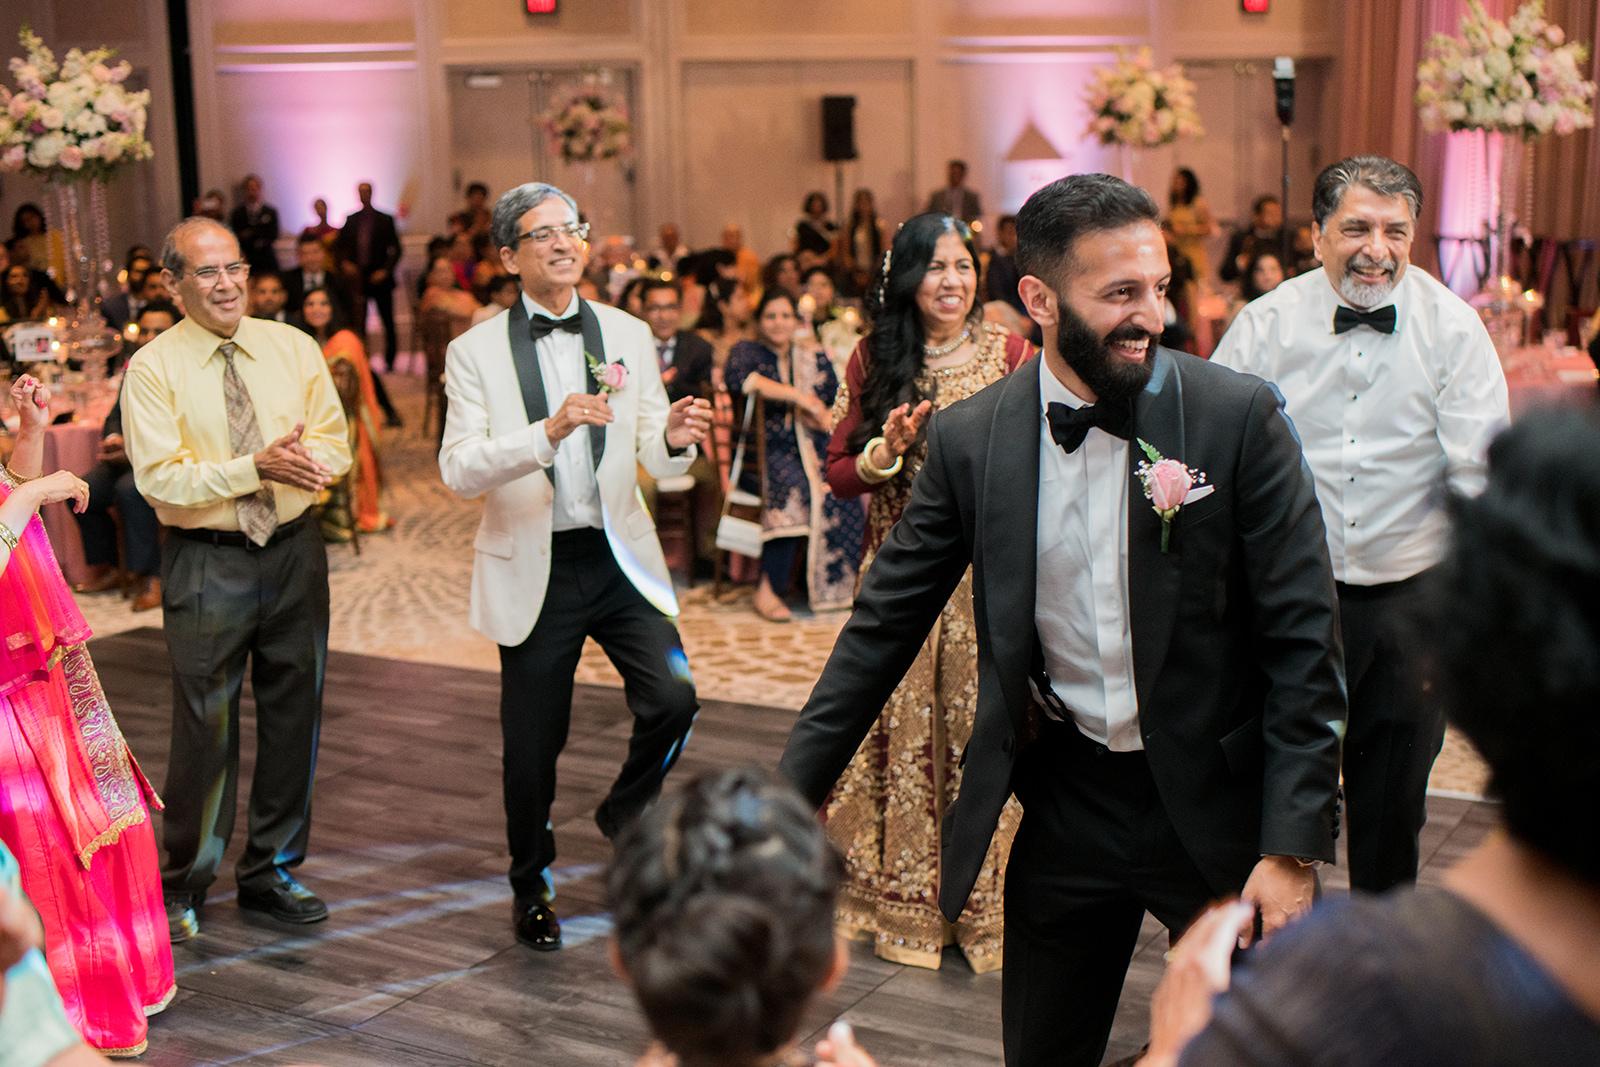 Le Cape Weddings - Sumeet and Chavi - Reception   -92.jpg